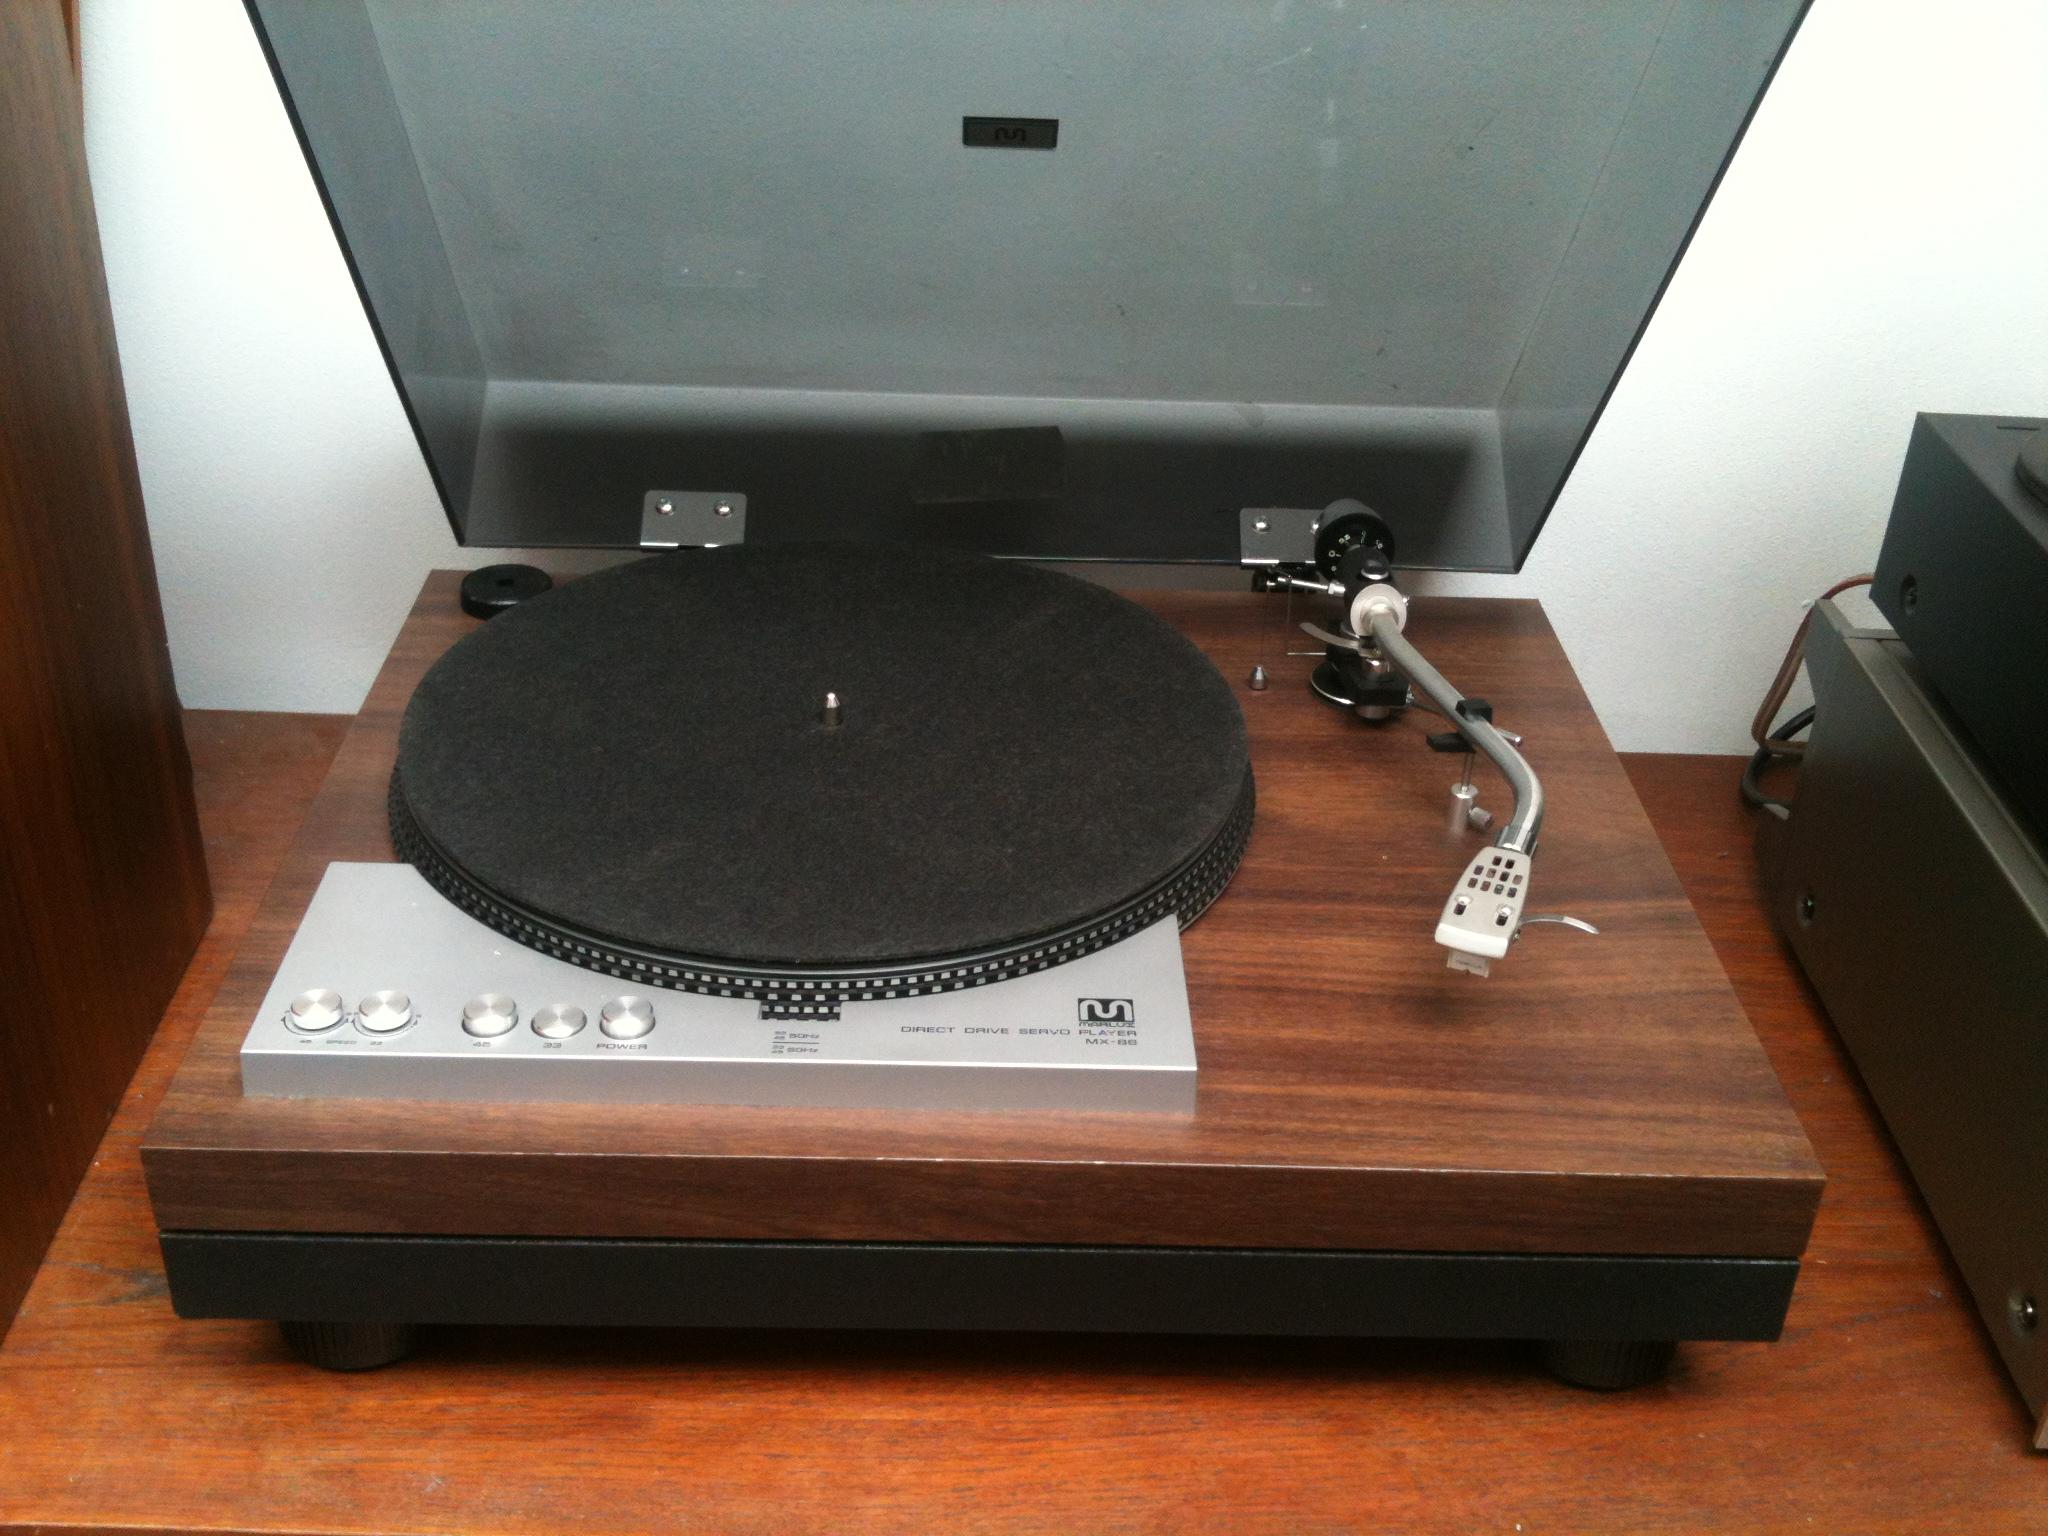 Rare platine vinyles marlux mx 86 audiophile vintage direct drive turntable - Platines vinyles vintage ...